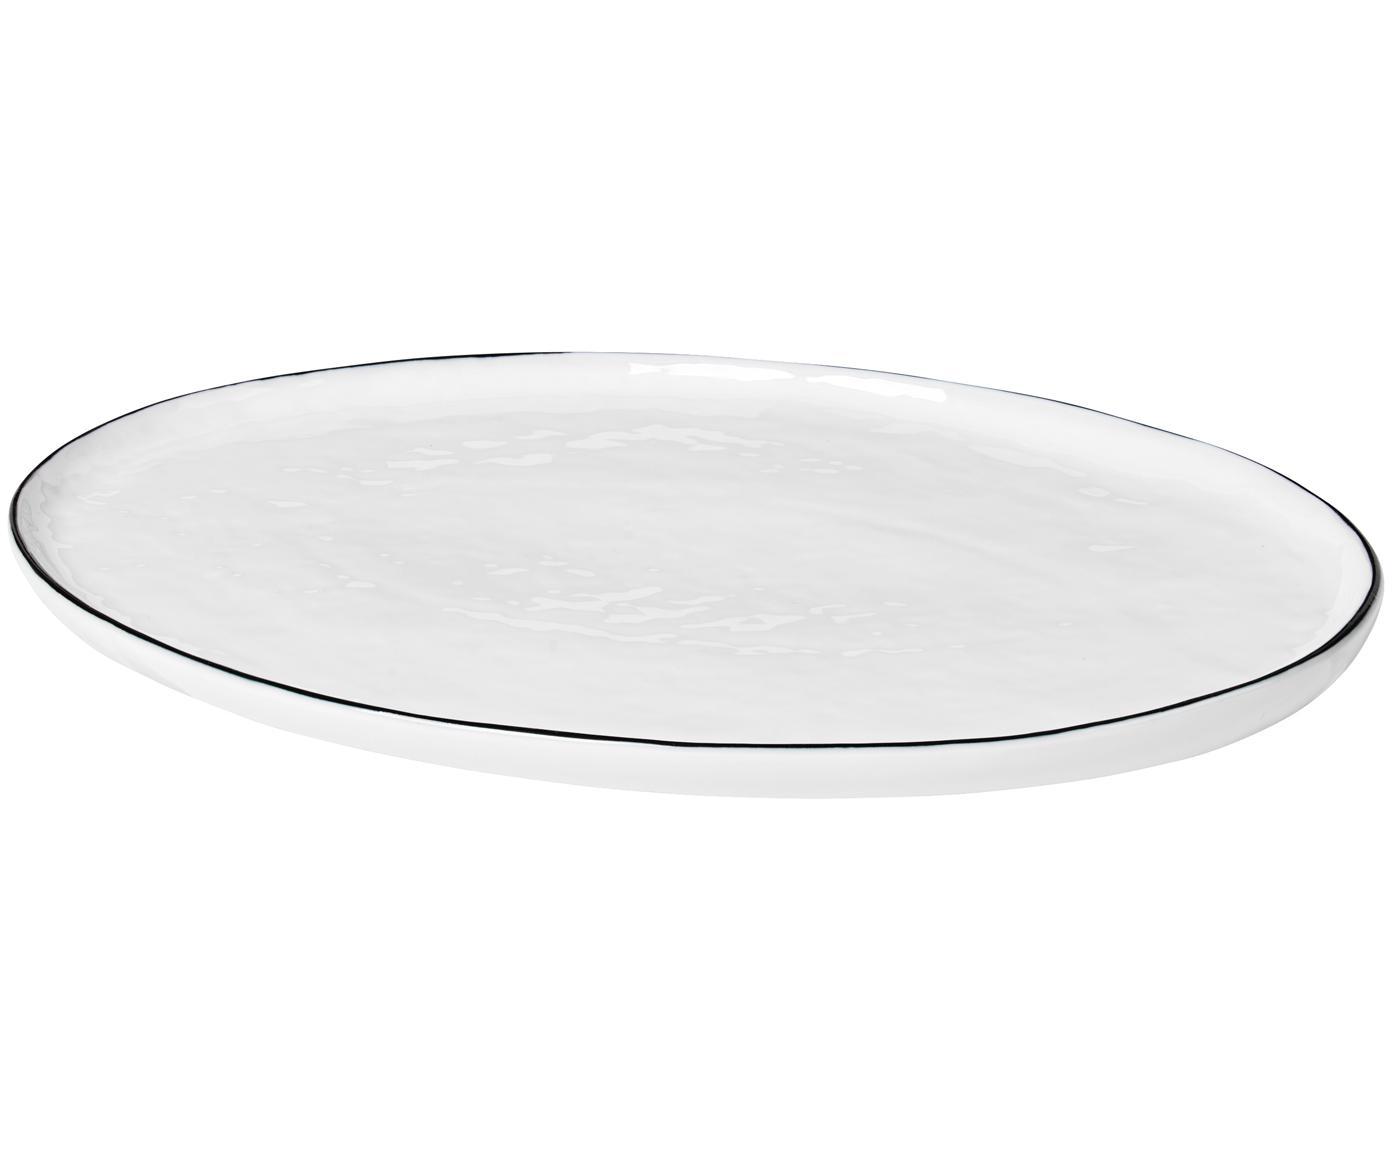 Handgemaakt serveerbord Salt, Porselein, Gebroken wit. Rand: zwart, 20 x 30 cm